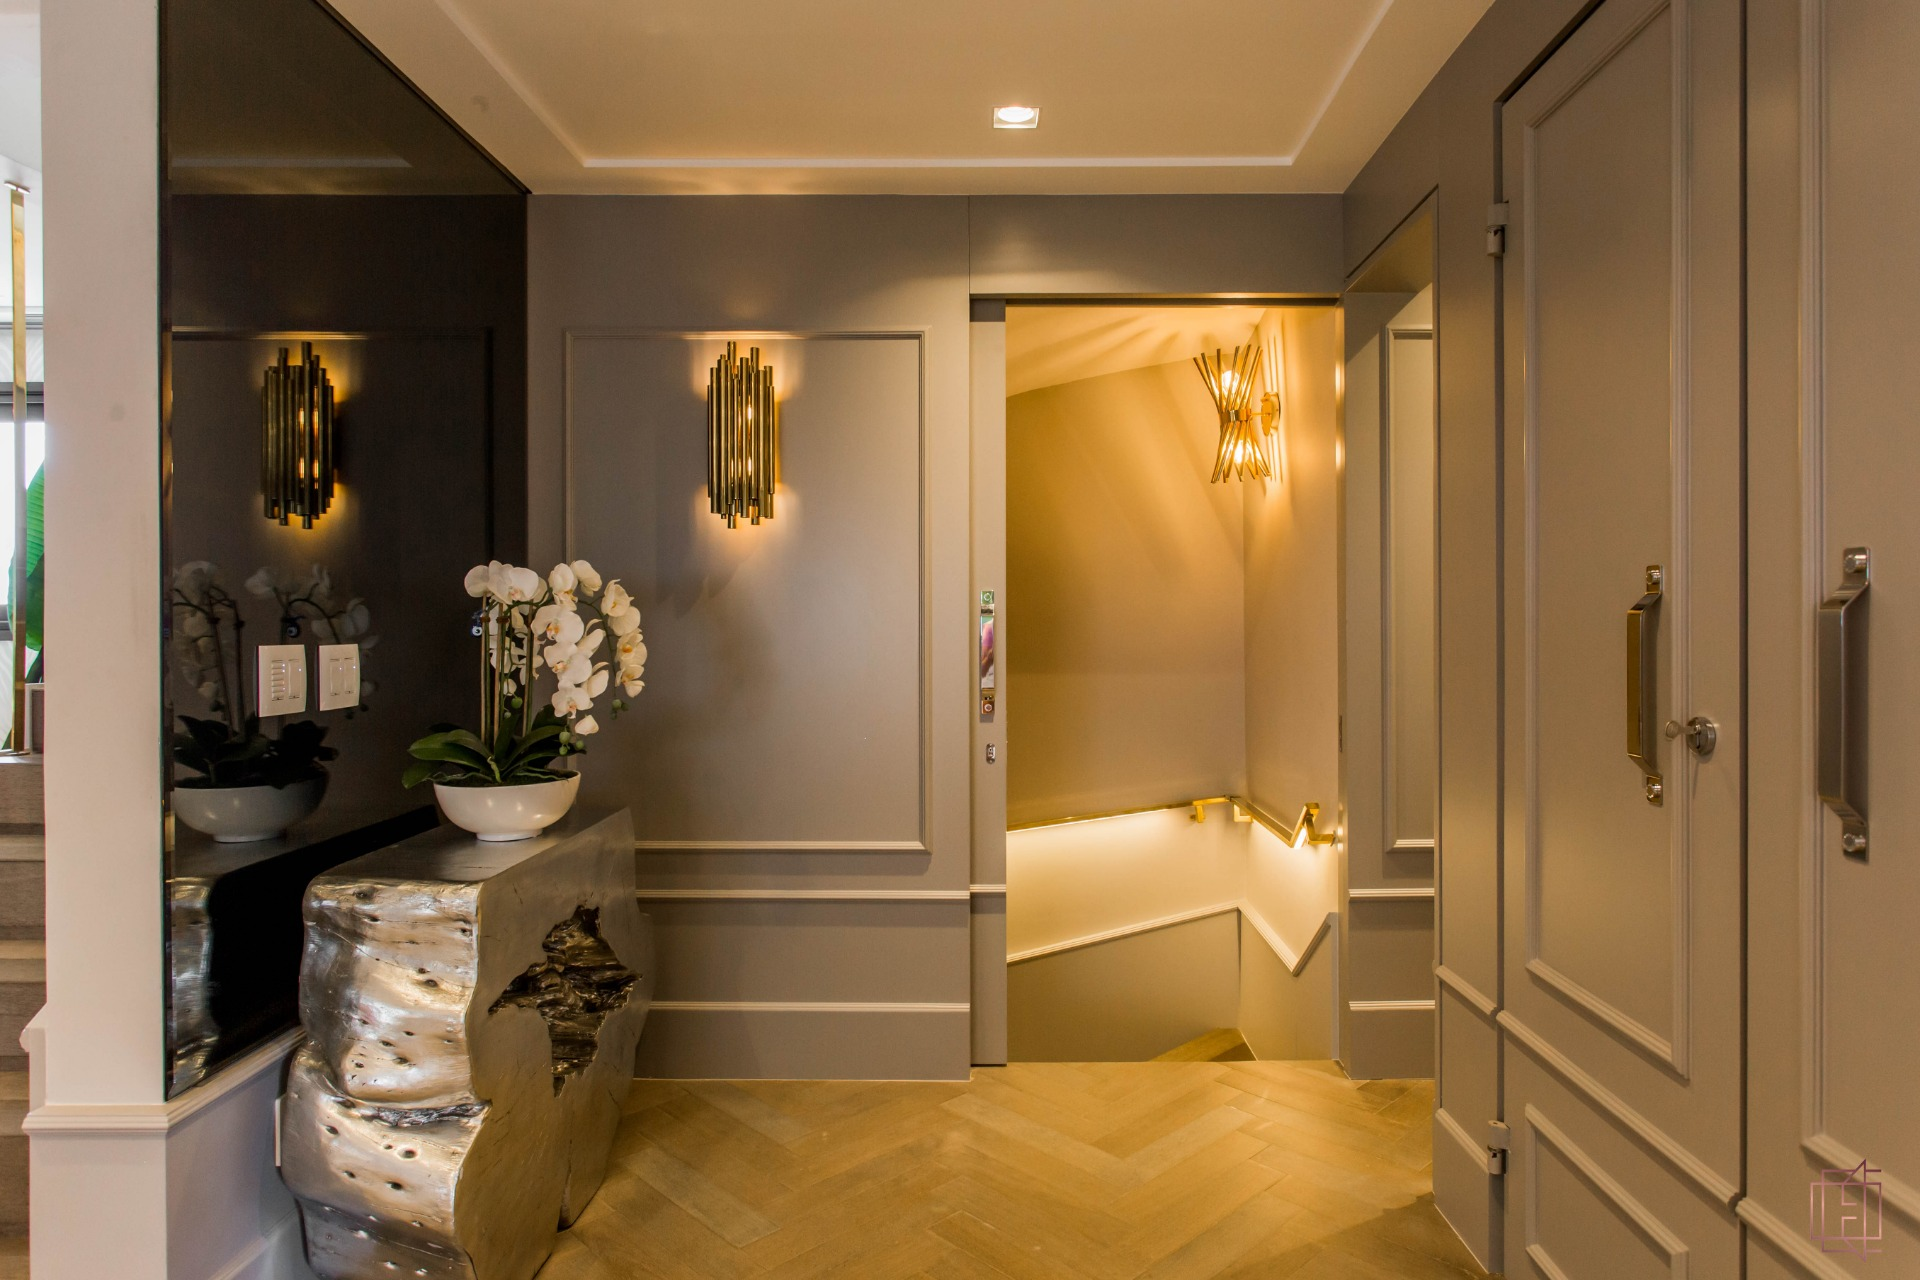 electrix design European Classic Meets Art Décor: CHECK OUT ⬇️ This Luxurious Penthouse in Brazil By Electrix Design! 2 14